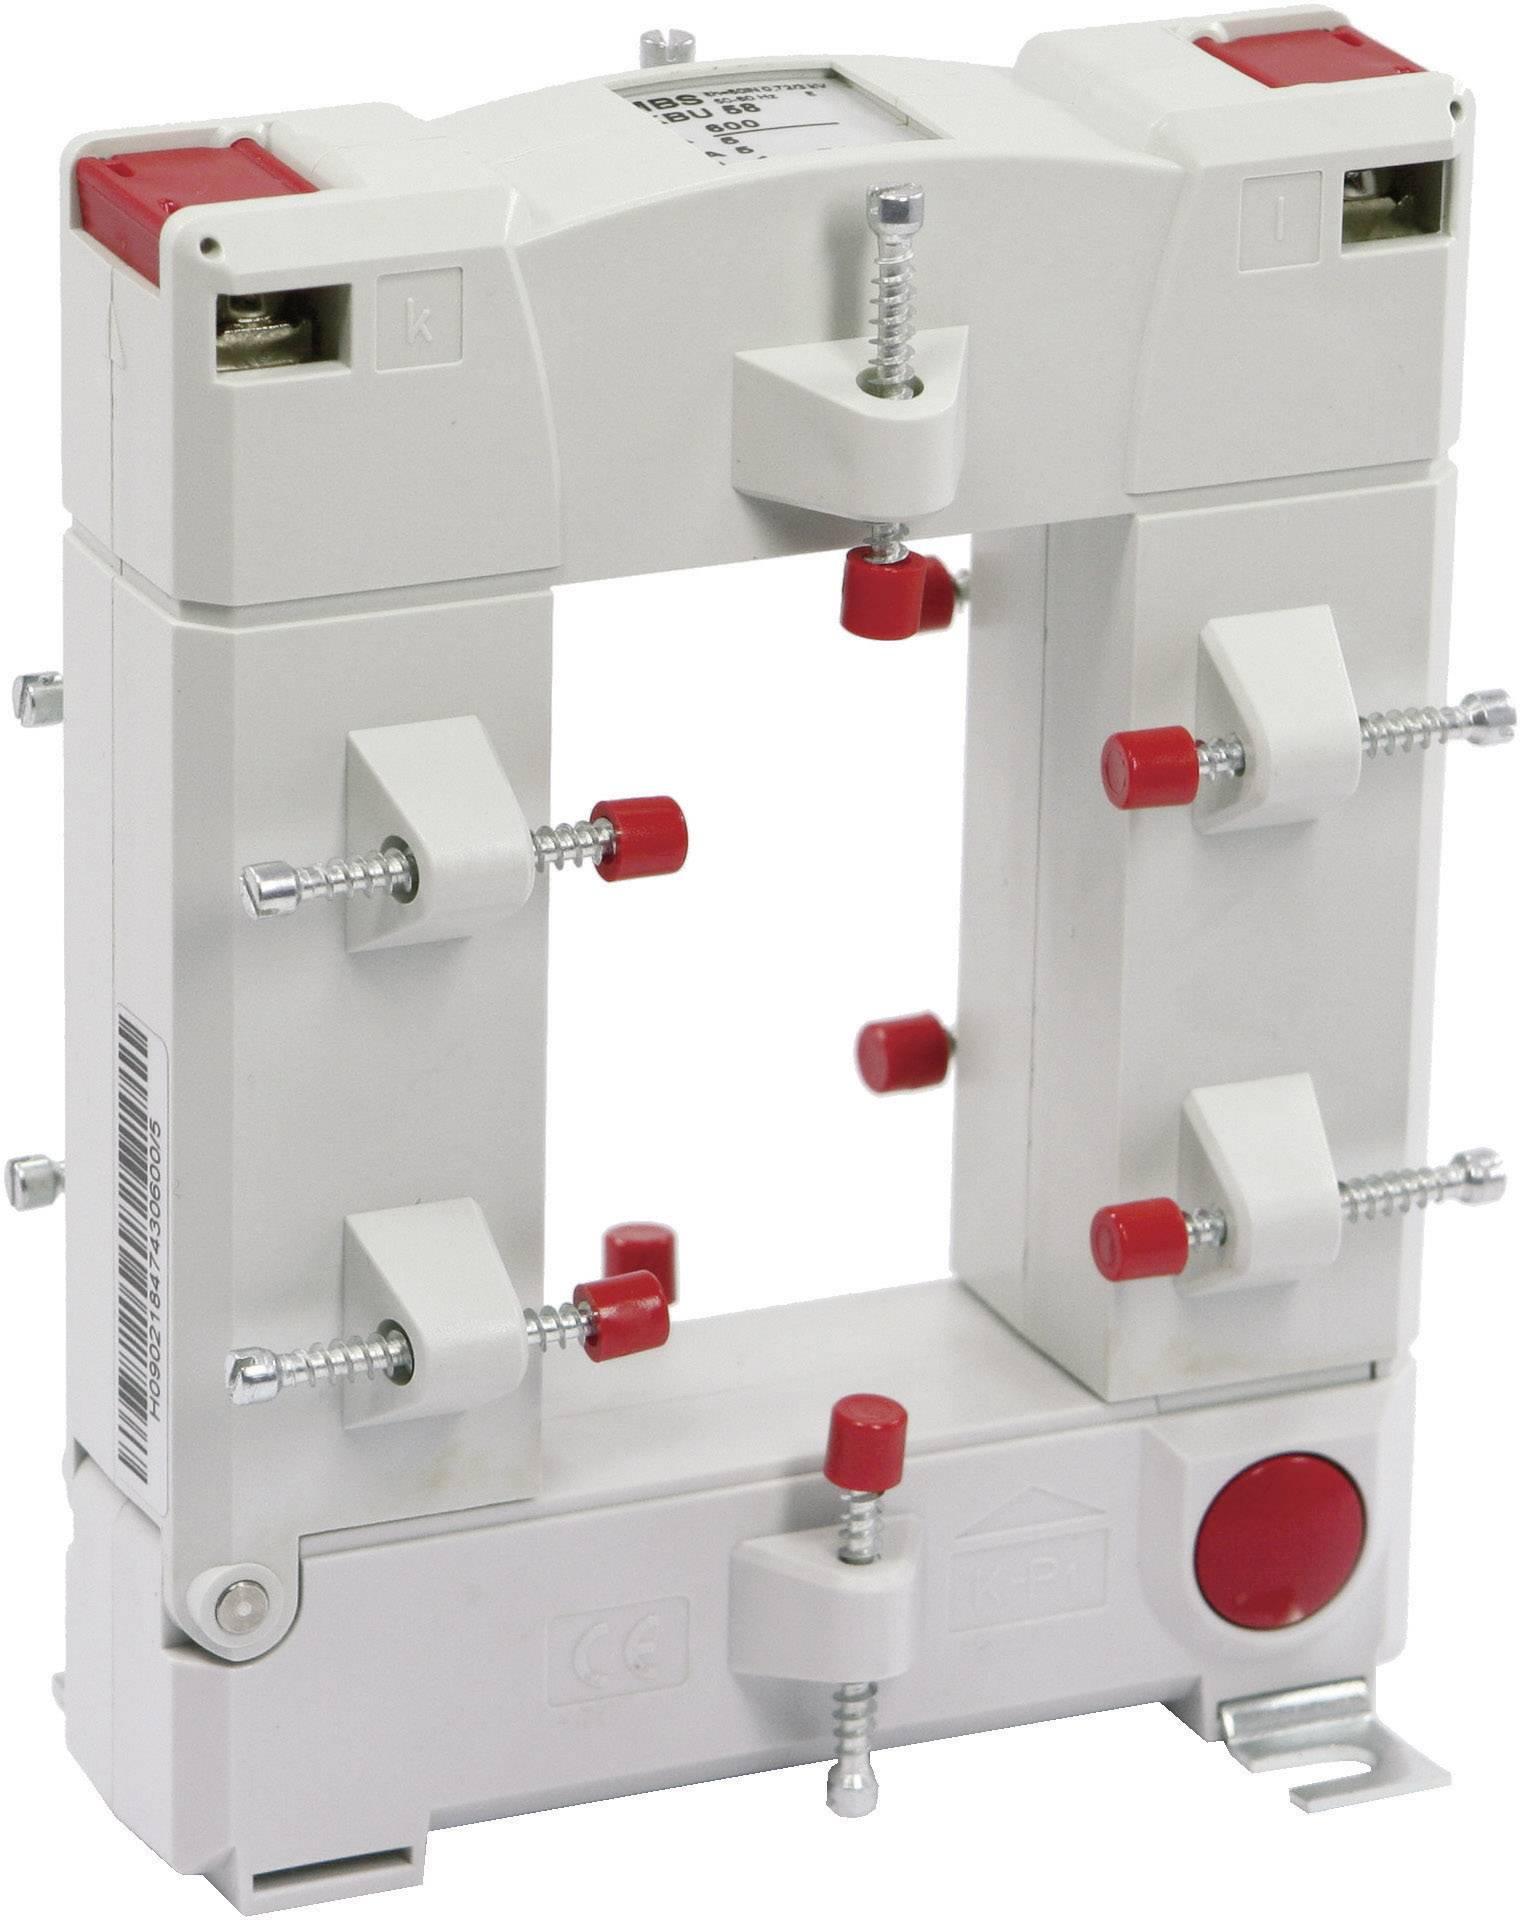 Zásuvný merací transformátor prúdu MBS KBU58 400/5A 2,5 VA KL.1